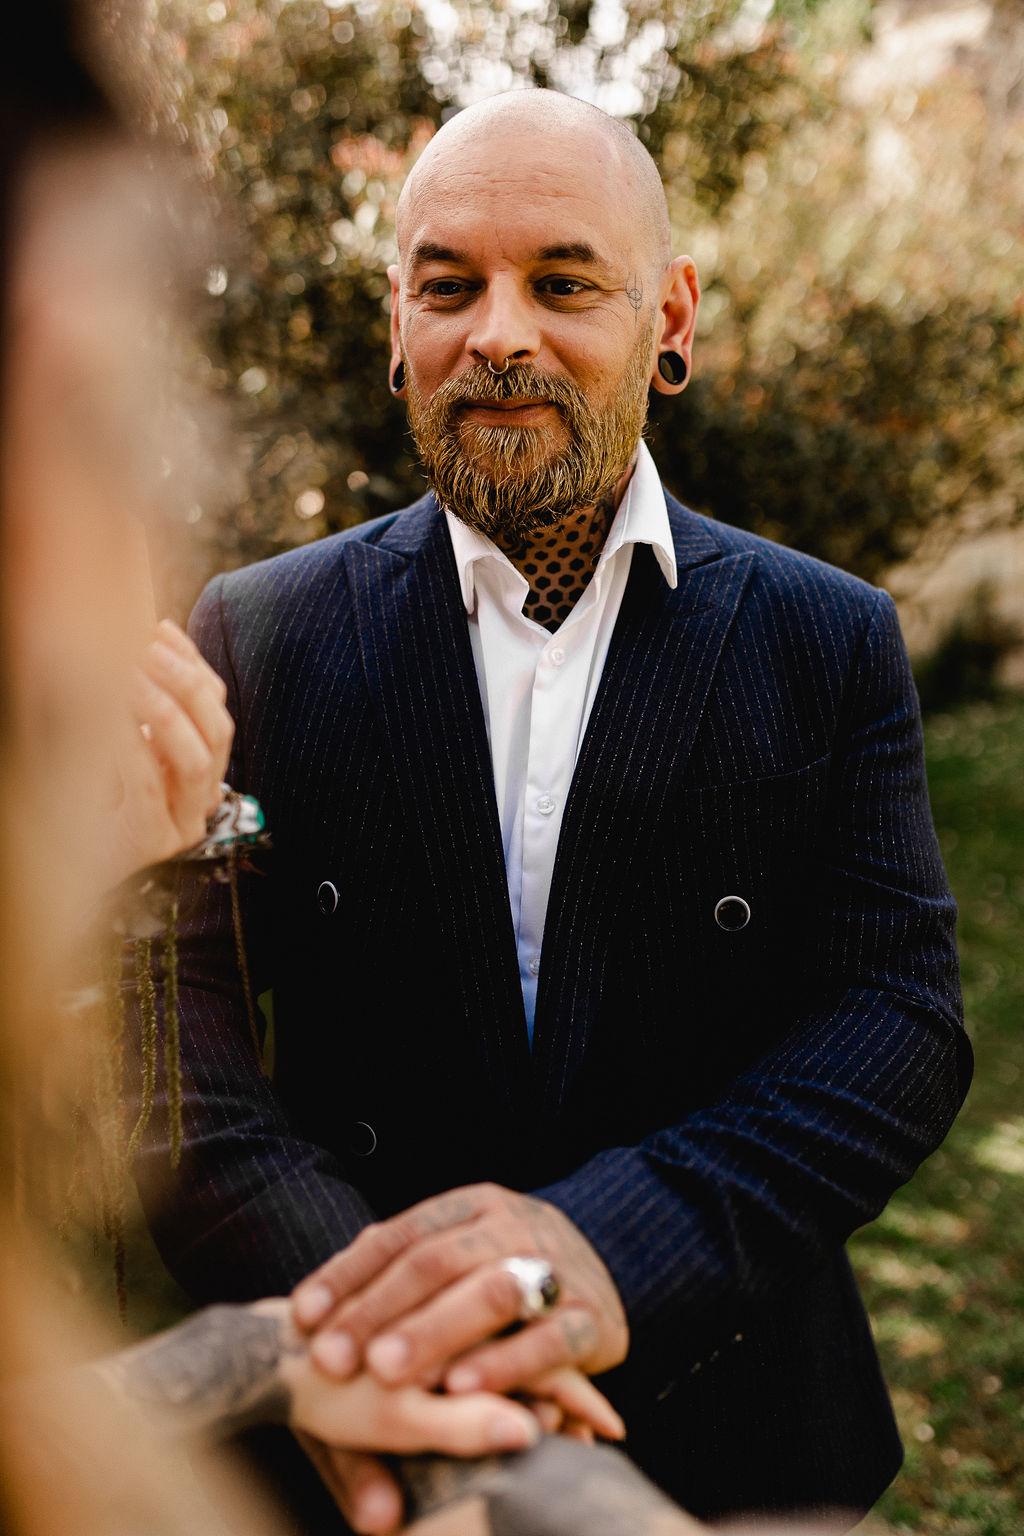 tattooed groom with gold beard - wedding beard glitter - alternative groom style